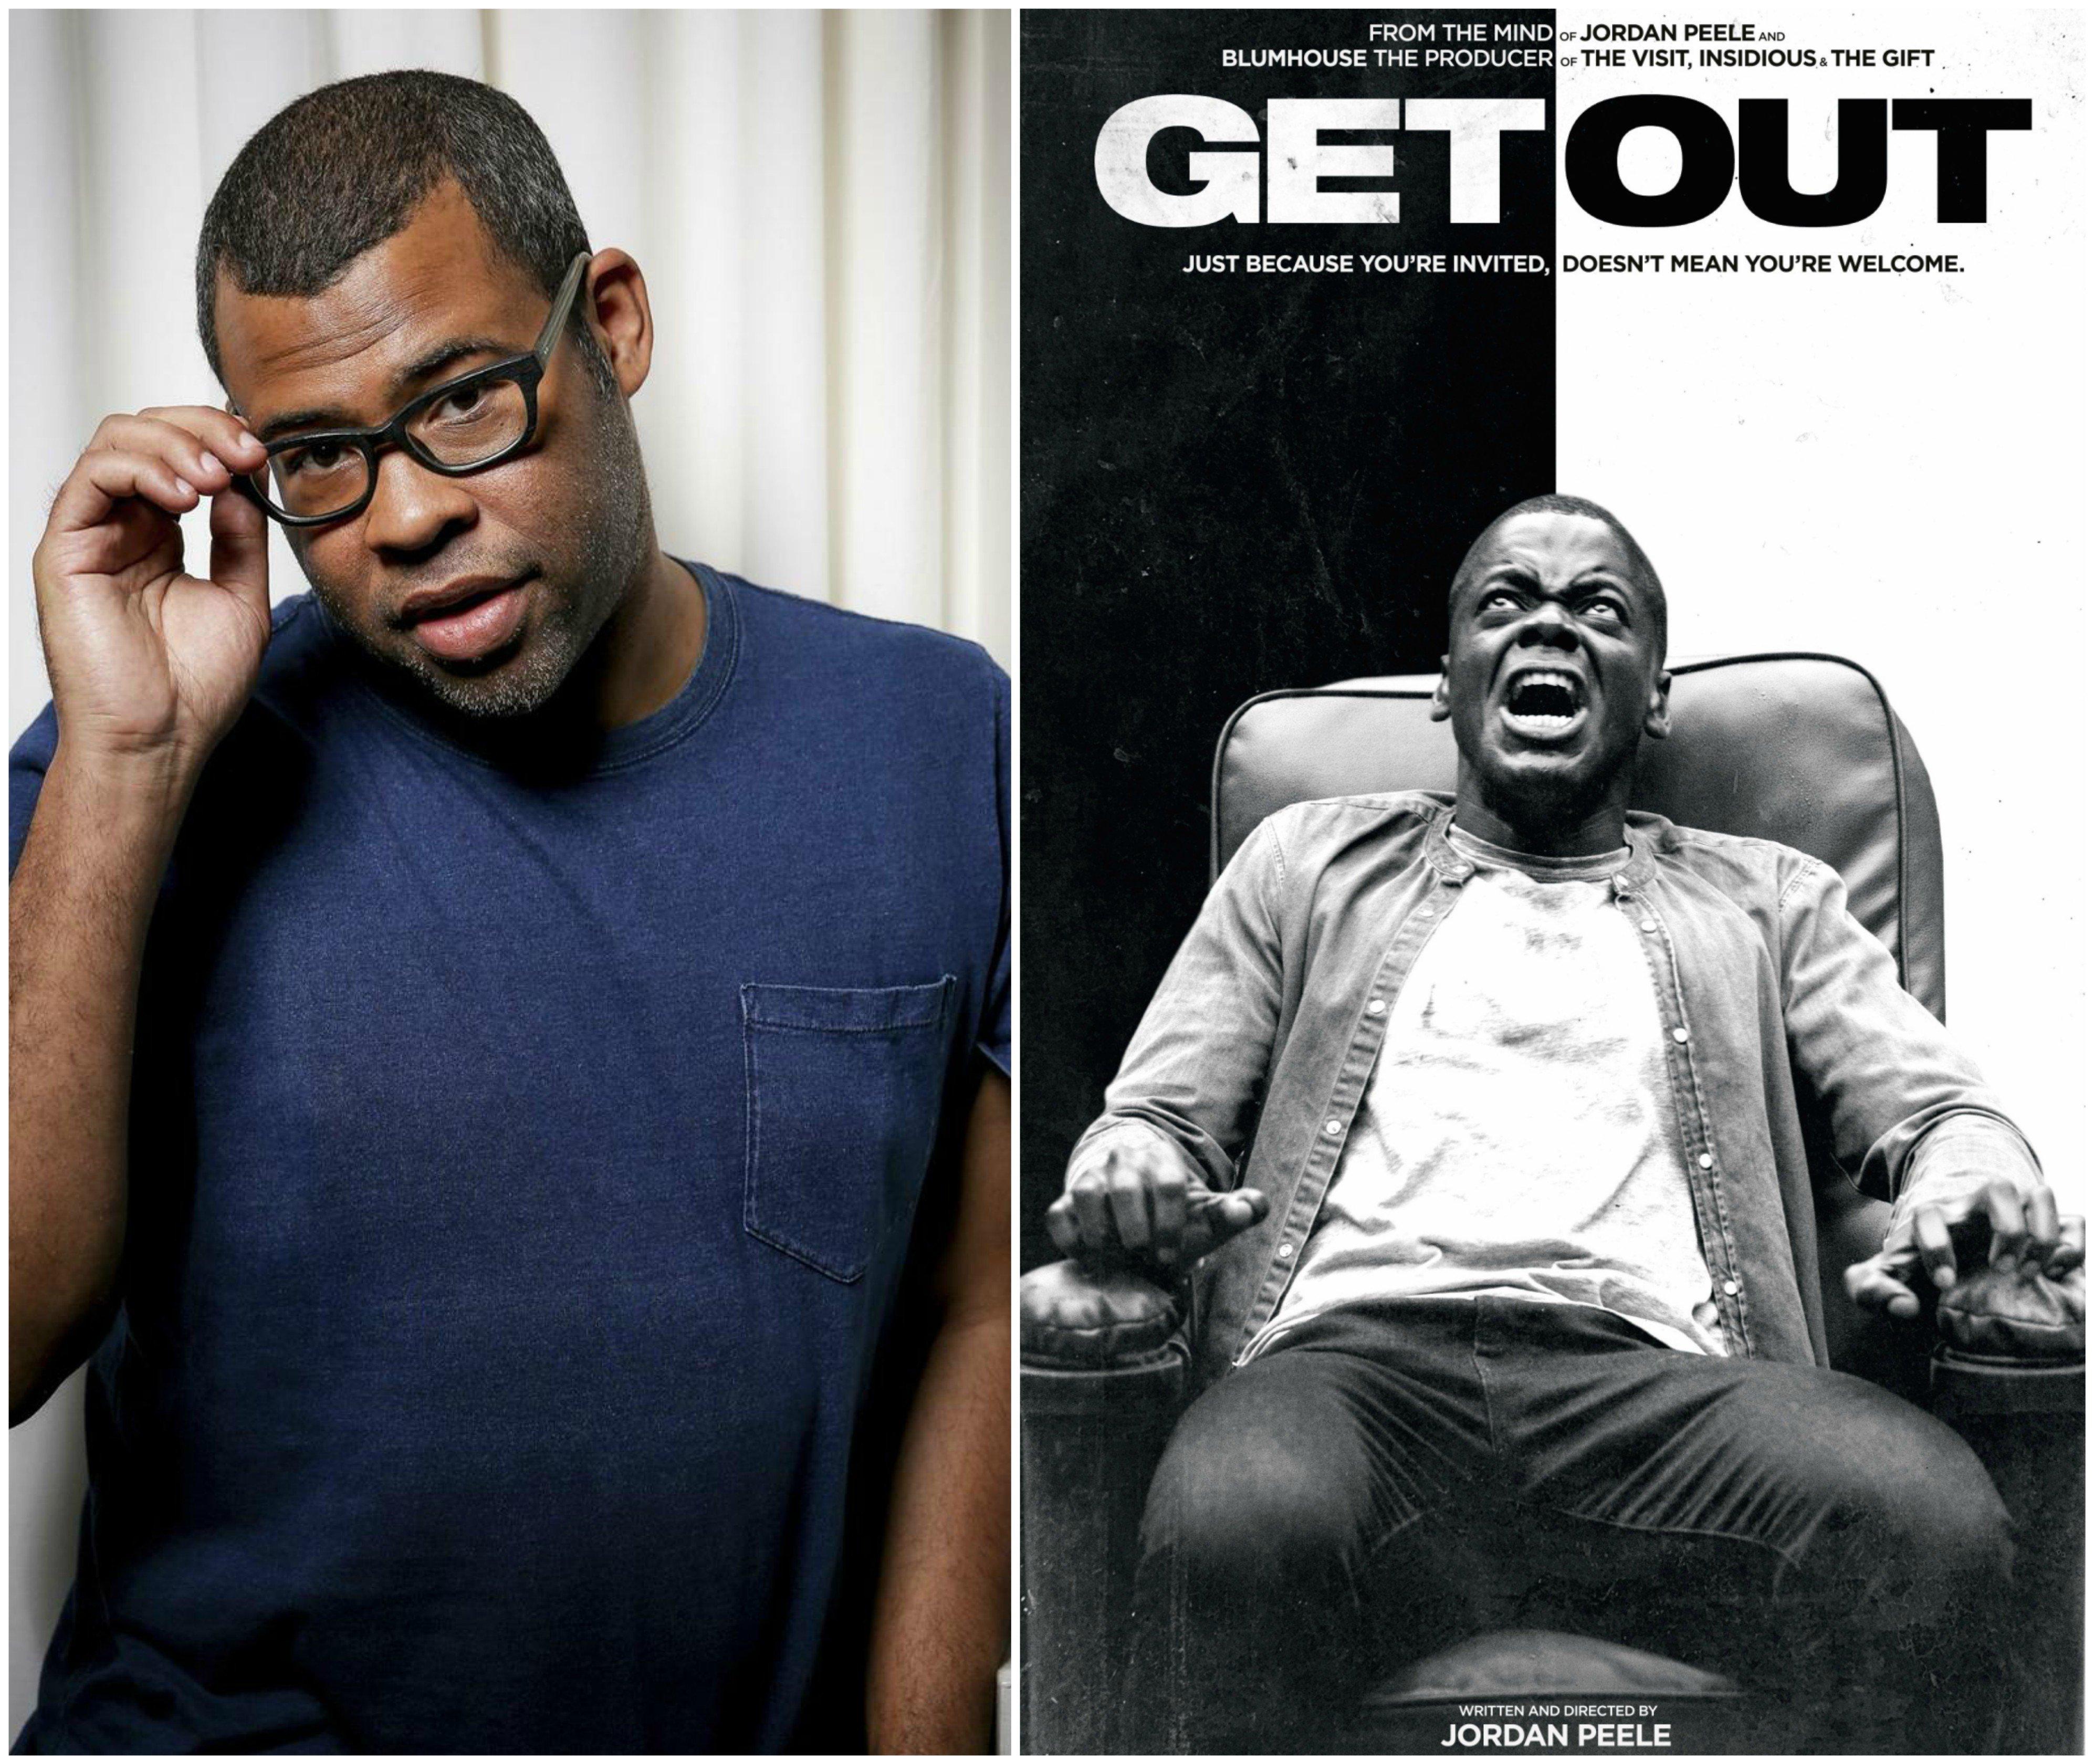 """Get Out"" Starring Daniel Kaluuya Wins Oscars Award for Best Original Screenplay"